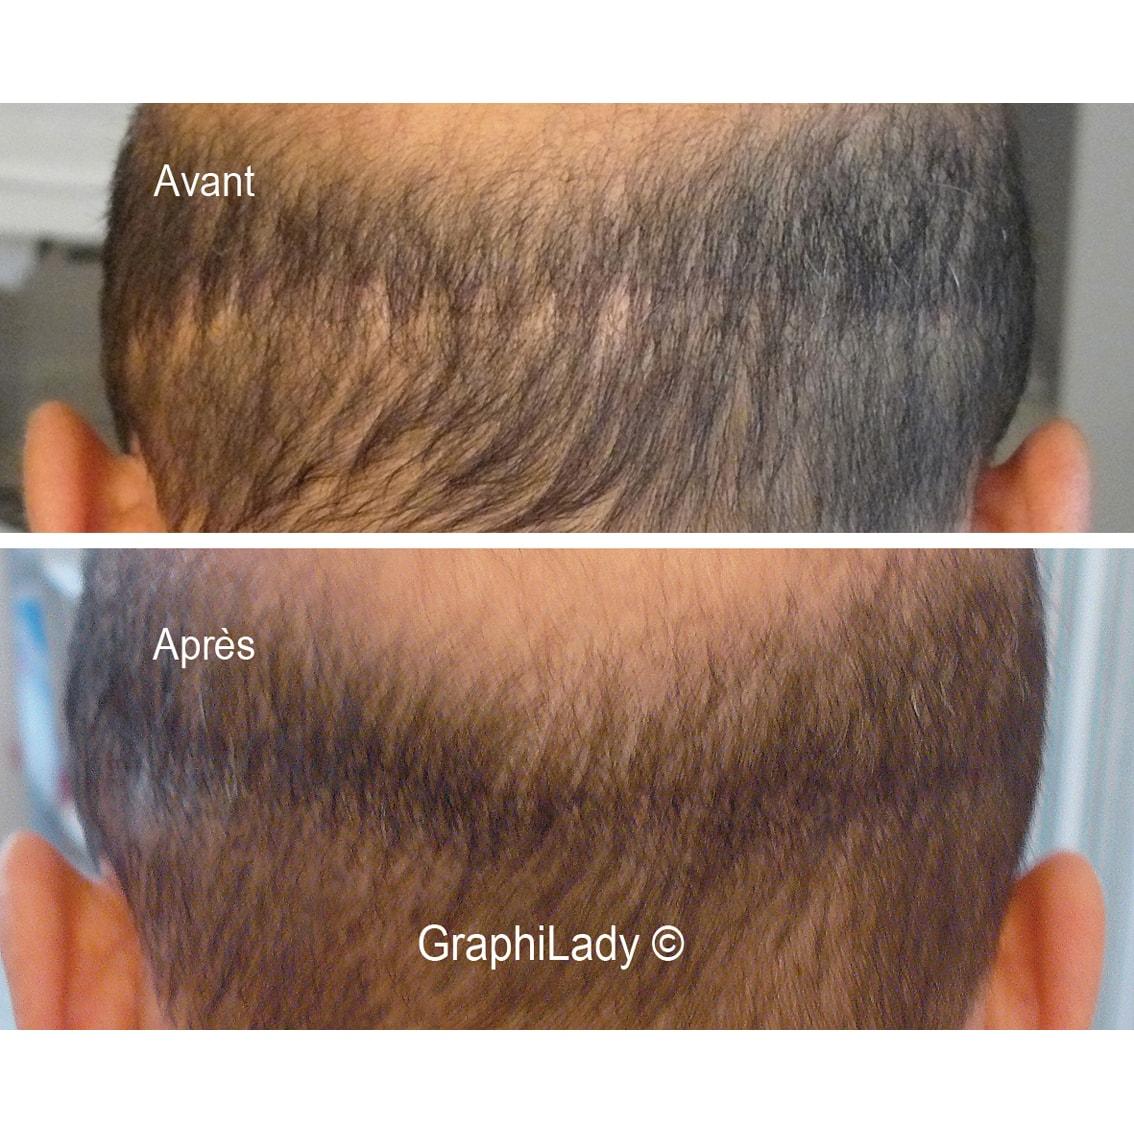 maquillage permanent cicatrice 05